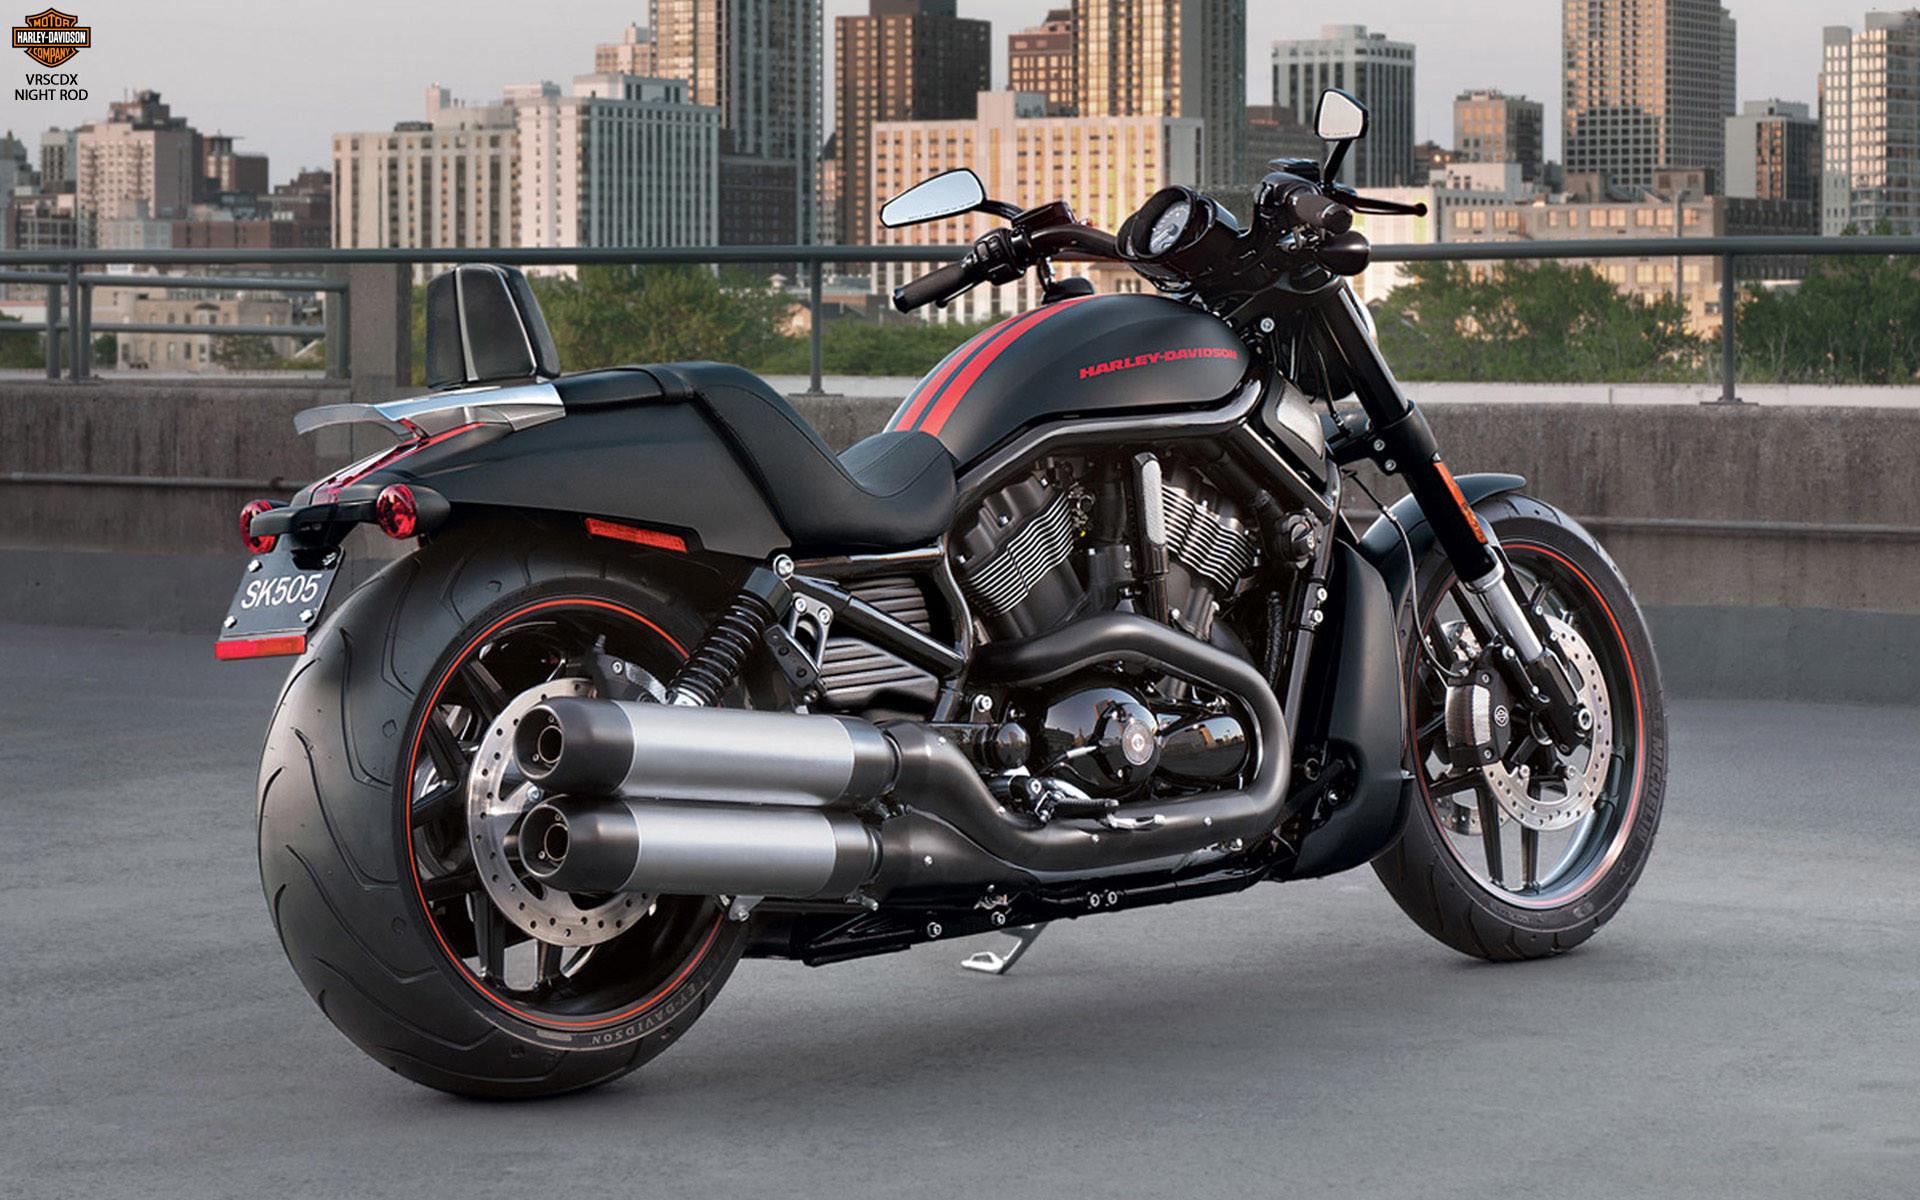 Harley Davidson VRSCDX Night Rod PC Wallpaper